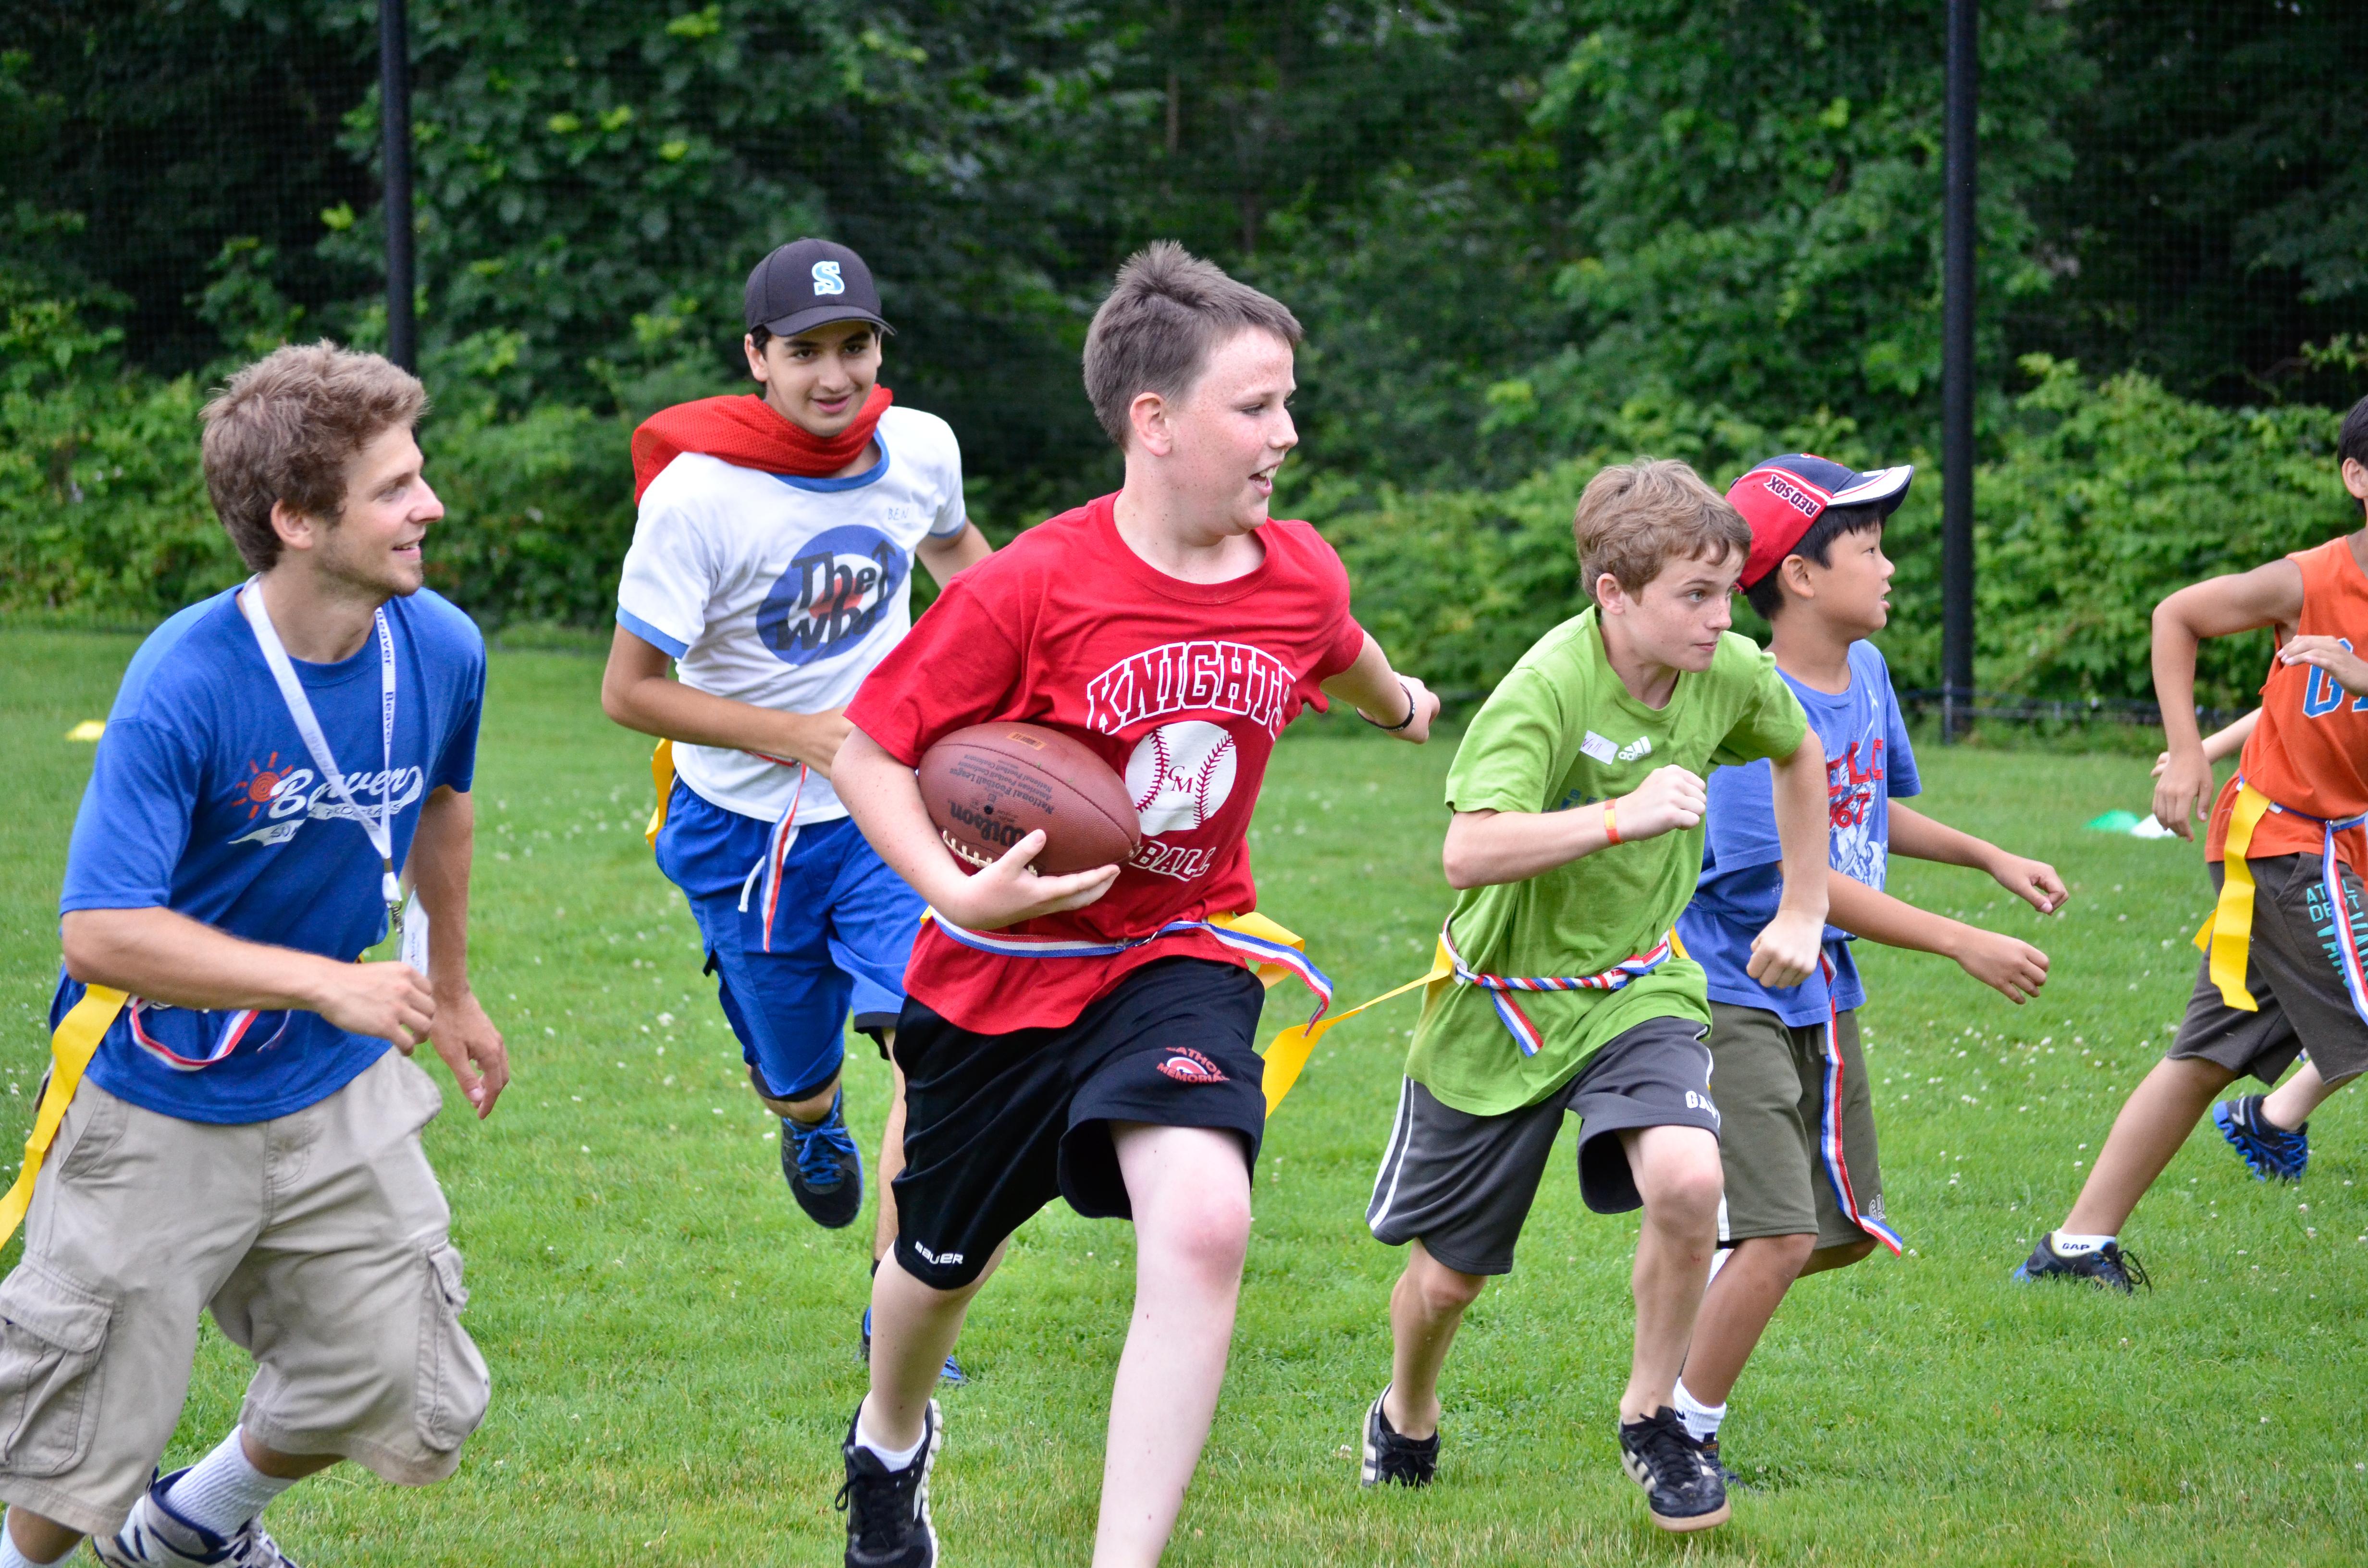 Summer Program - Water Sports | Beaver Summer Camp: Senior Camp